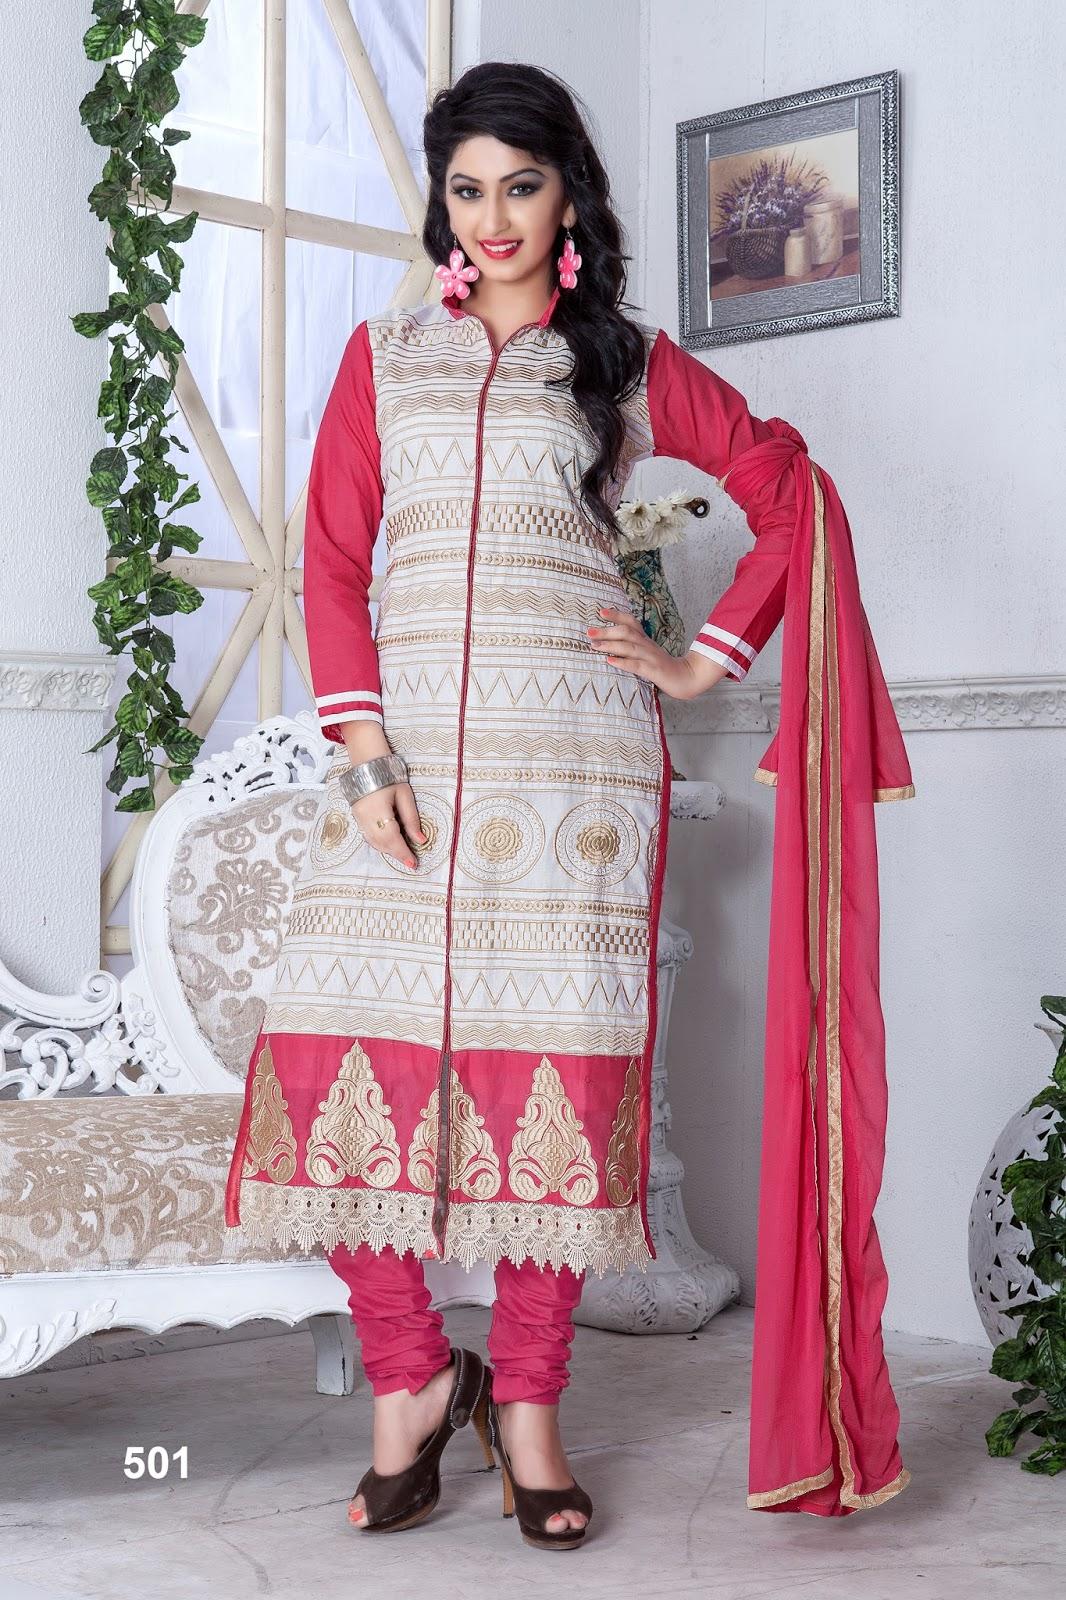 Sabia 2 – Fancy Cotton Salwar Suit Dress Material